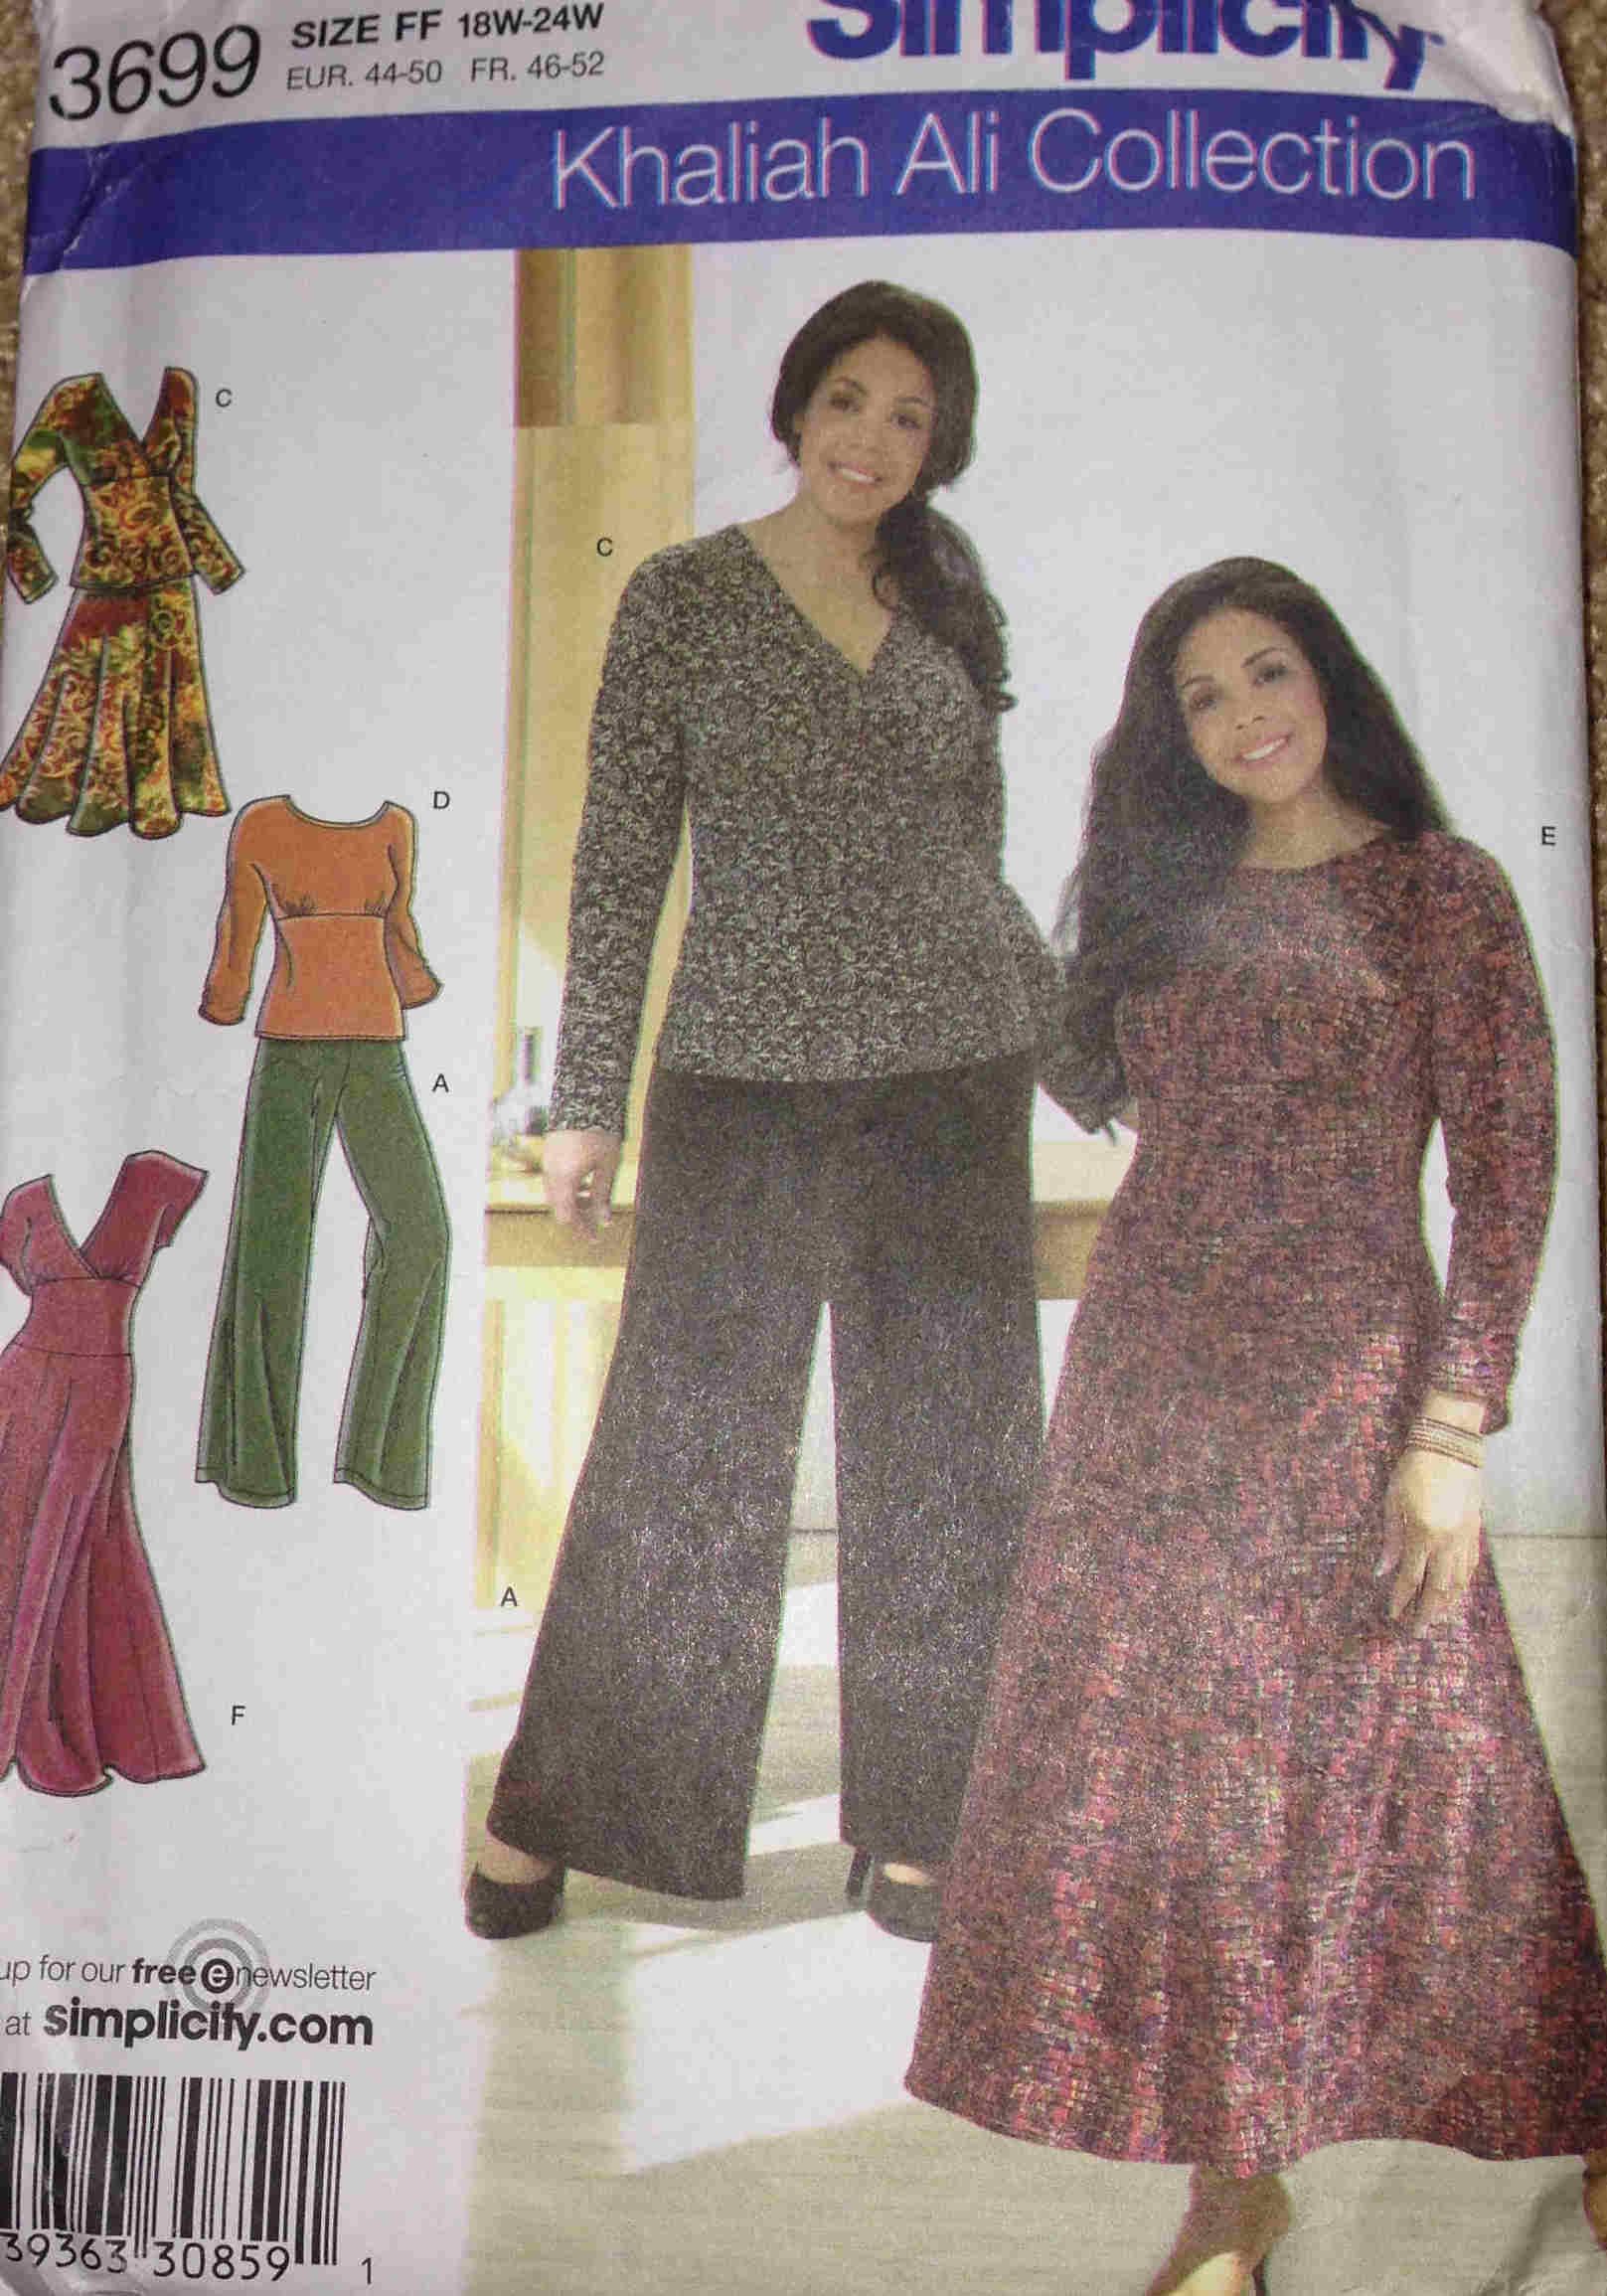 plus size top skirt pants dress sewing pattern